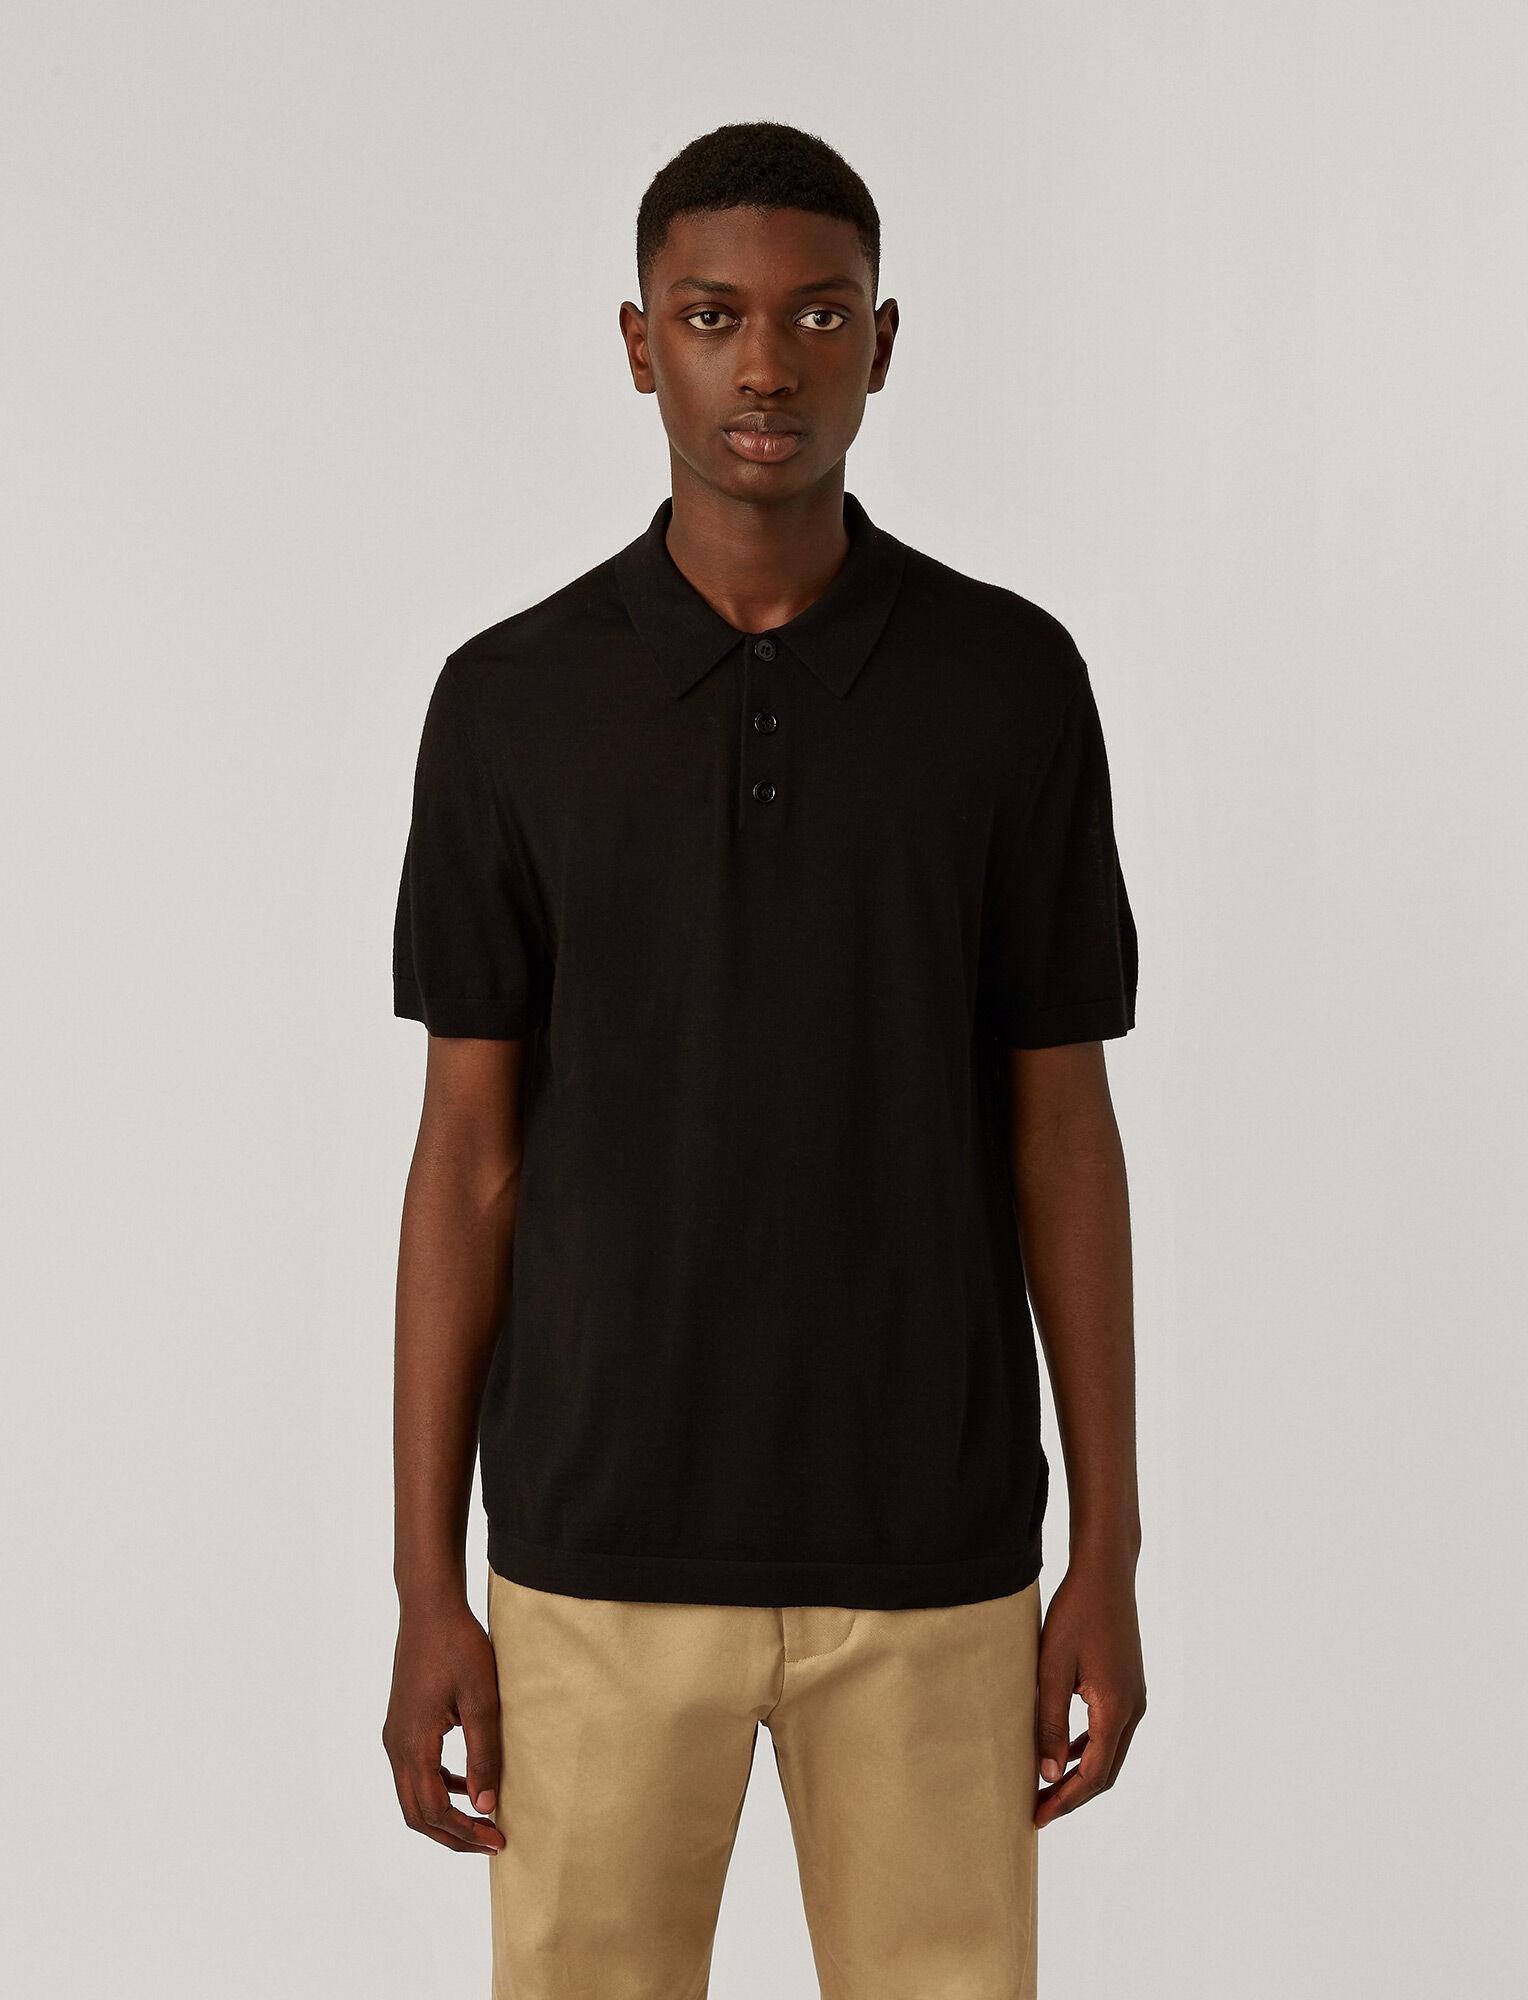 Joseph, Polo Light Merinos Knit, in BLACK